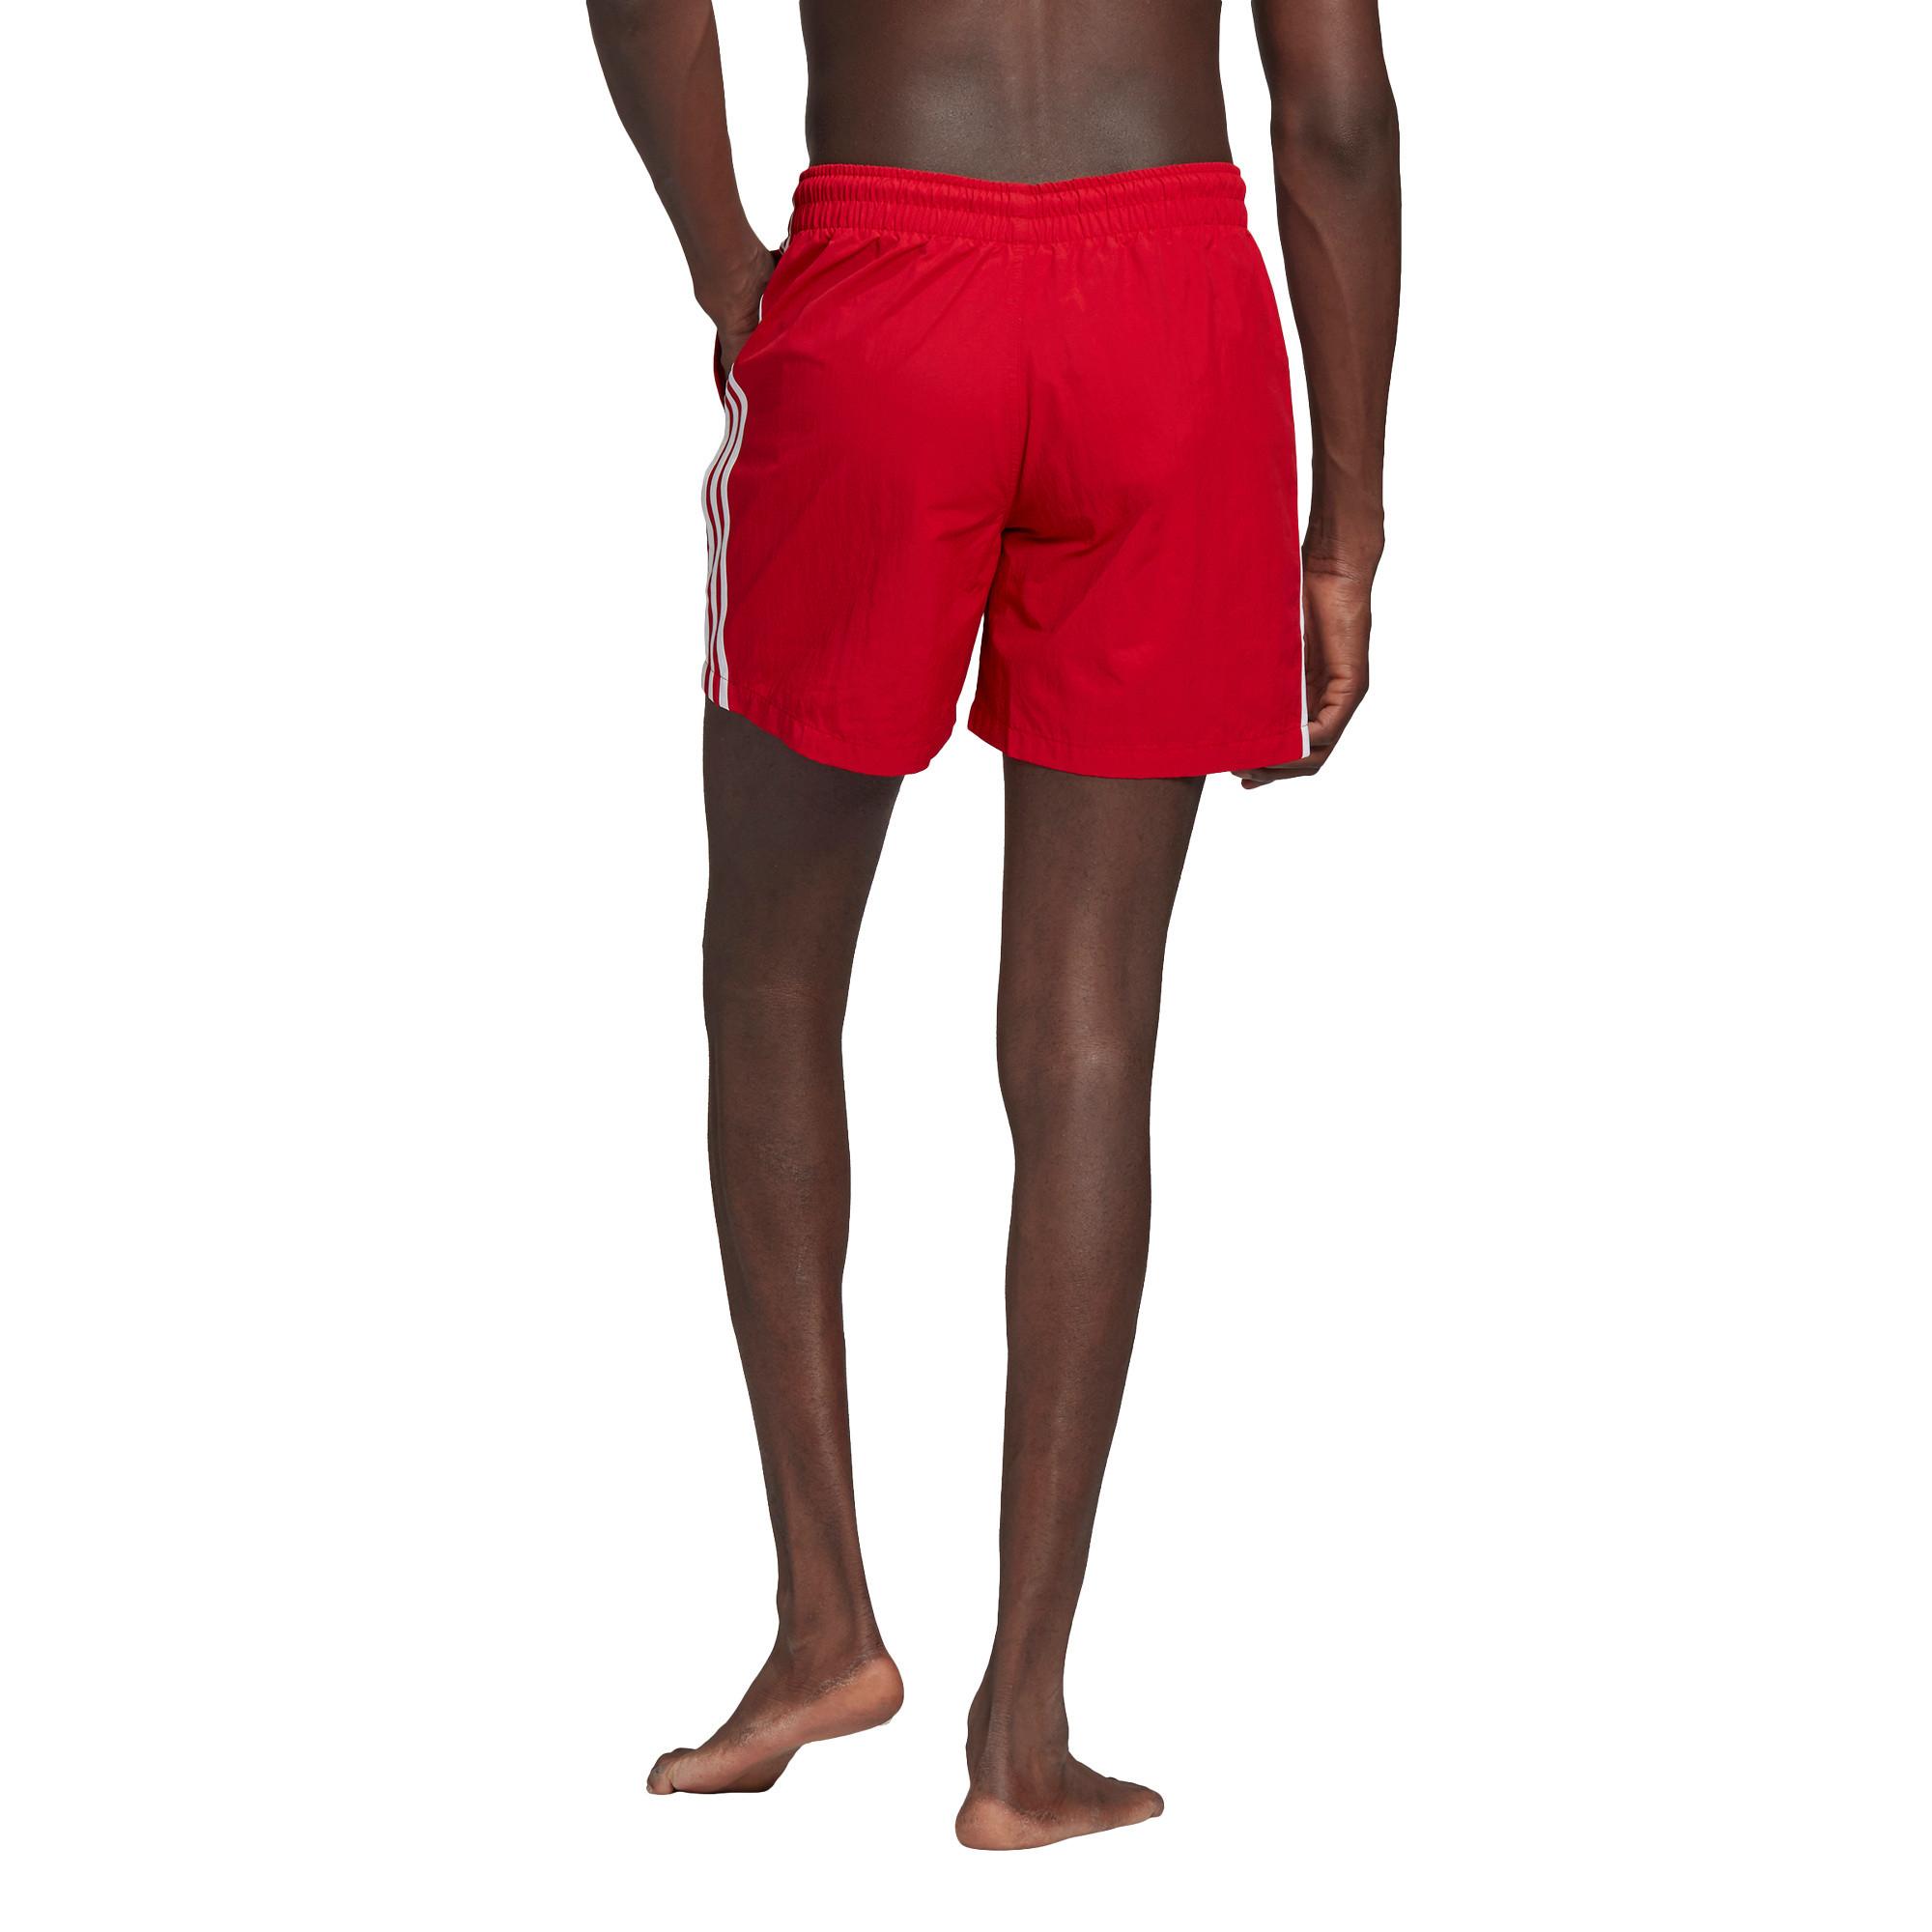 Short da nuoto adicolor classics 3-stripes, Rosso, large image number 2